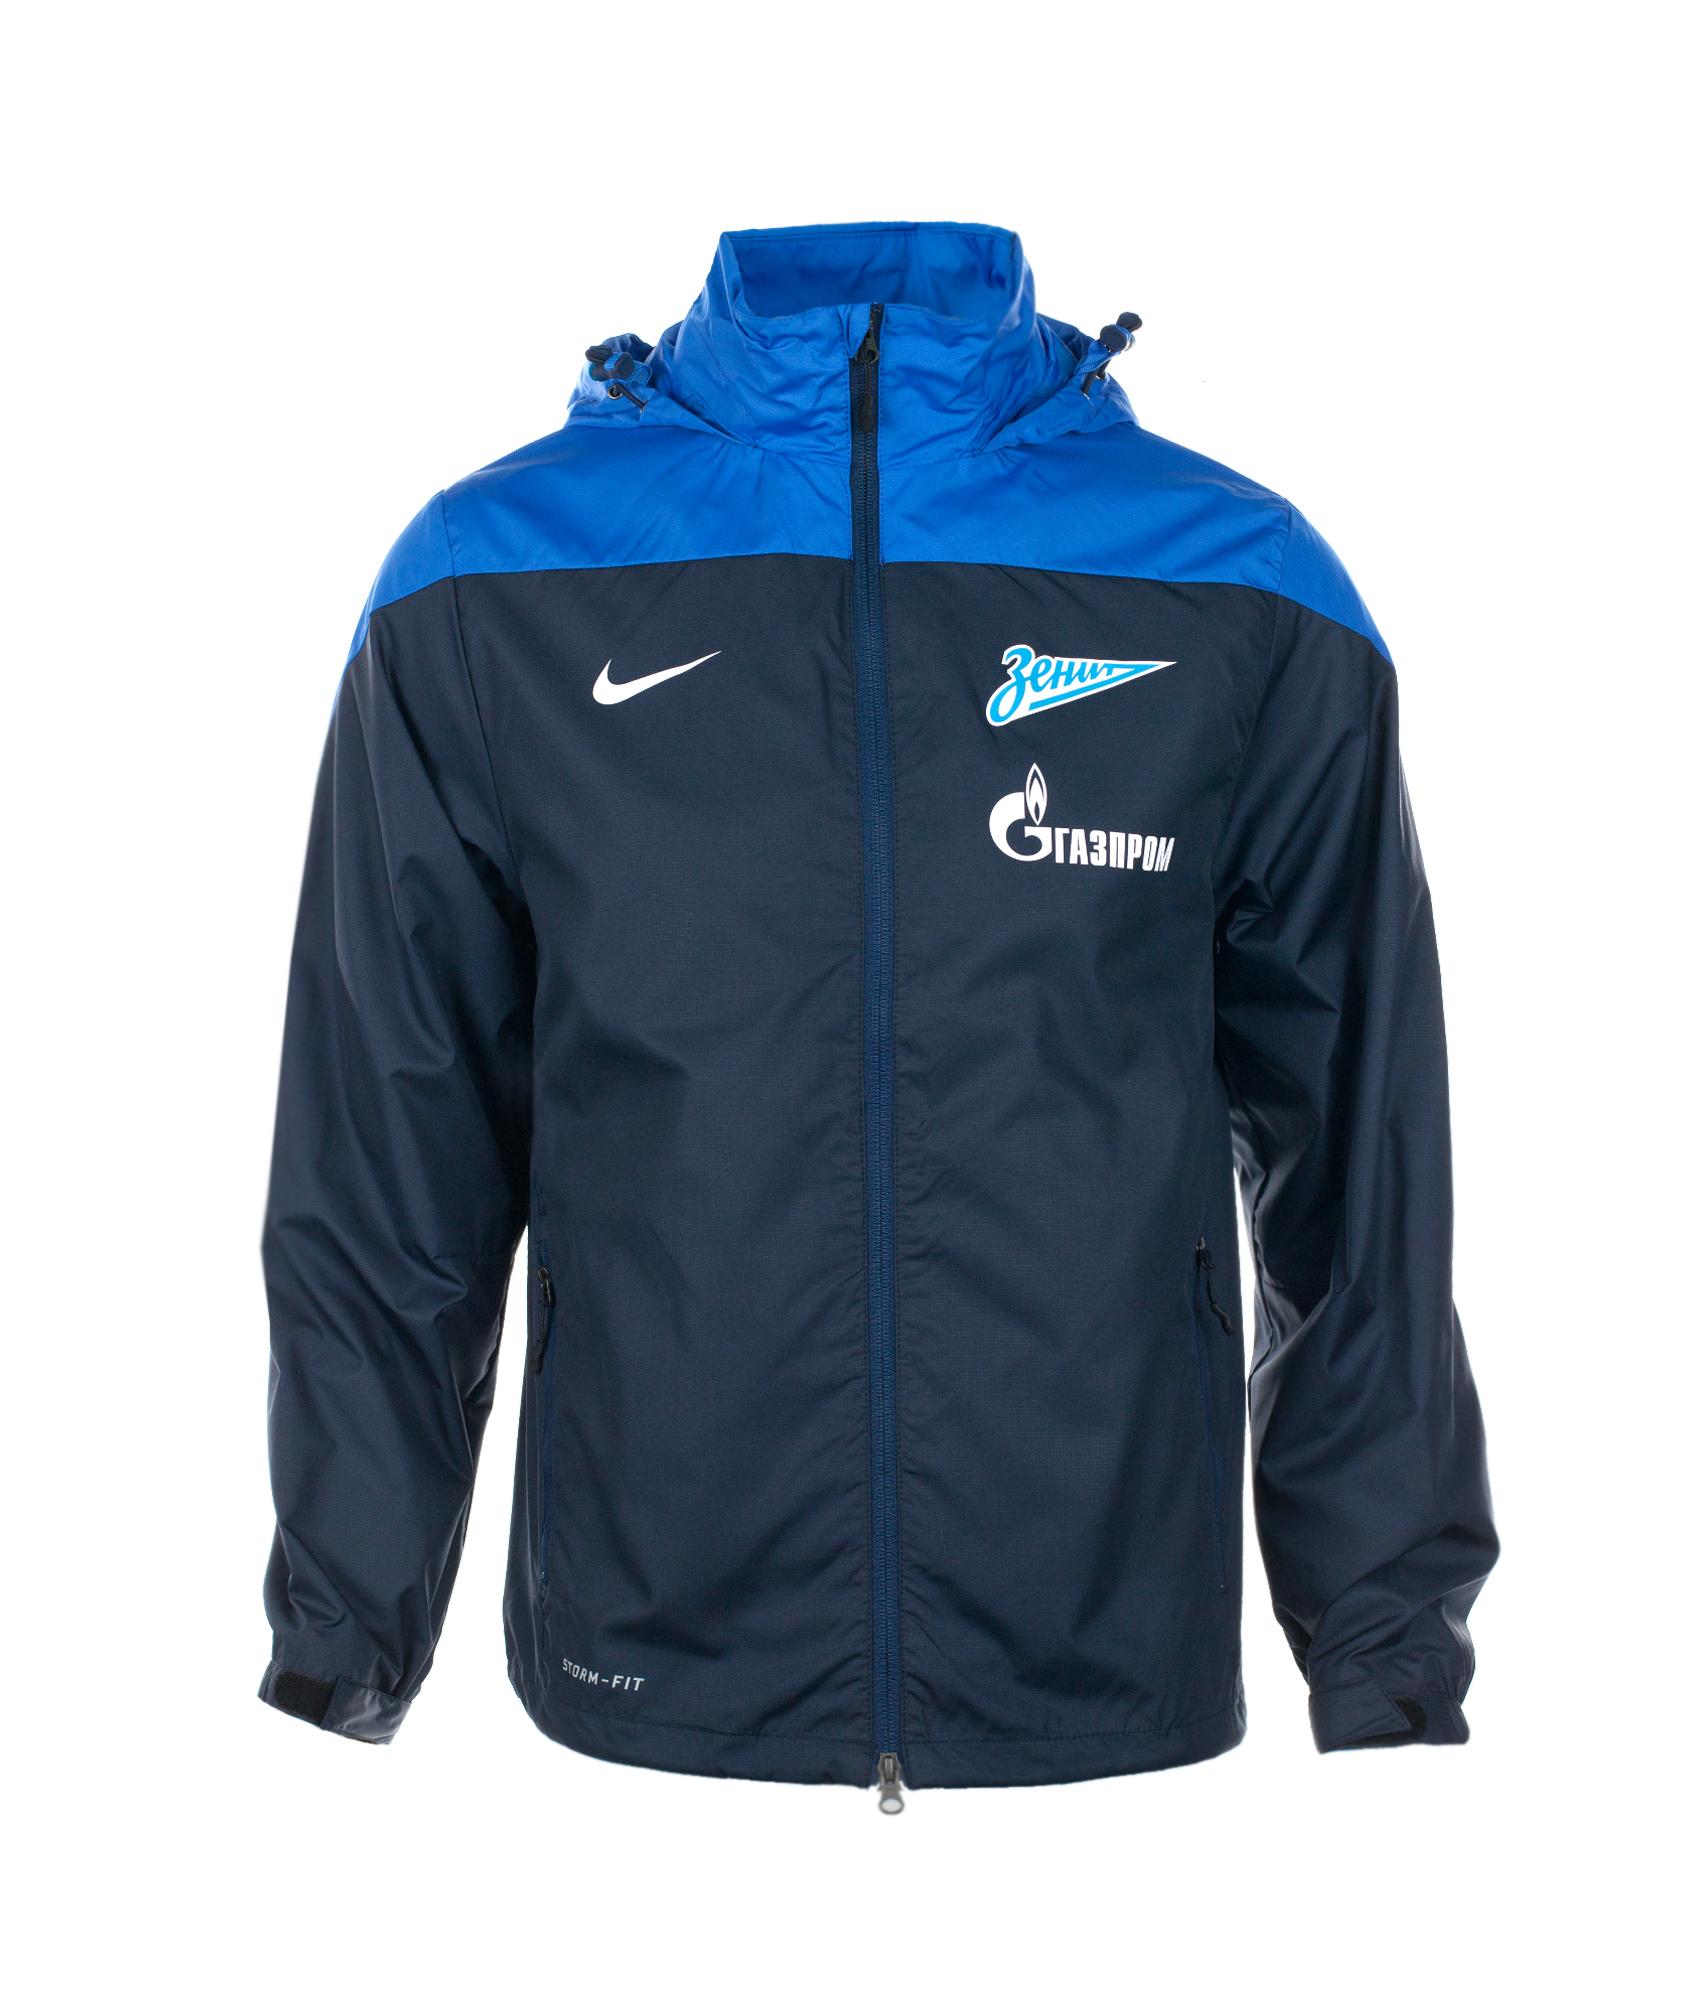 Ветровка Nike Zenit Squad SF1 RAIN JKT, Цвет-Синий, Размер-XXL